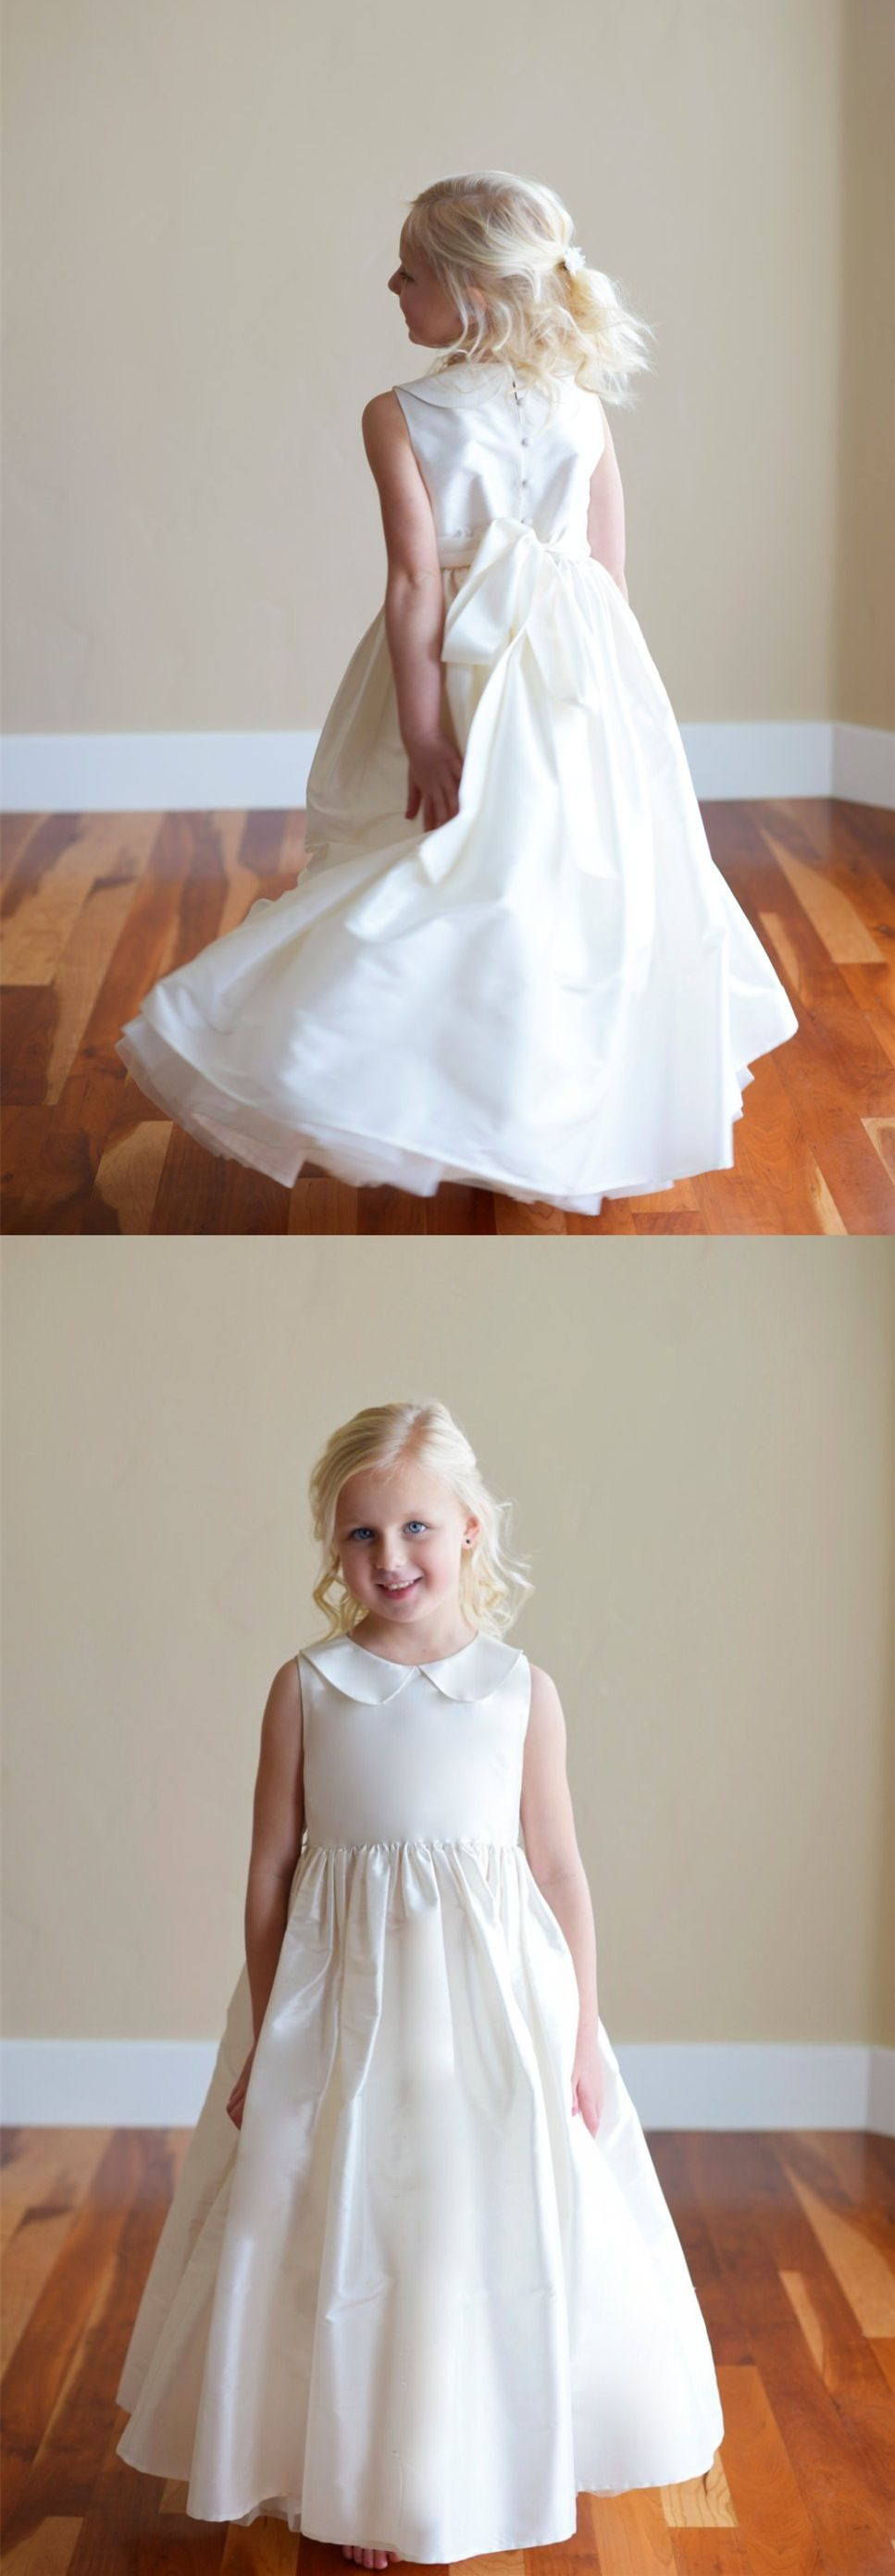 Flower girl dresses chic fashion wedding party dresses for girls